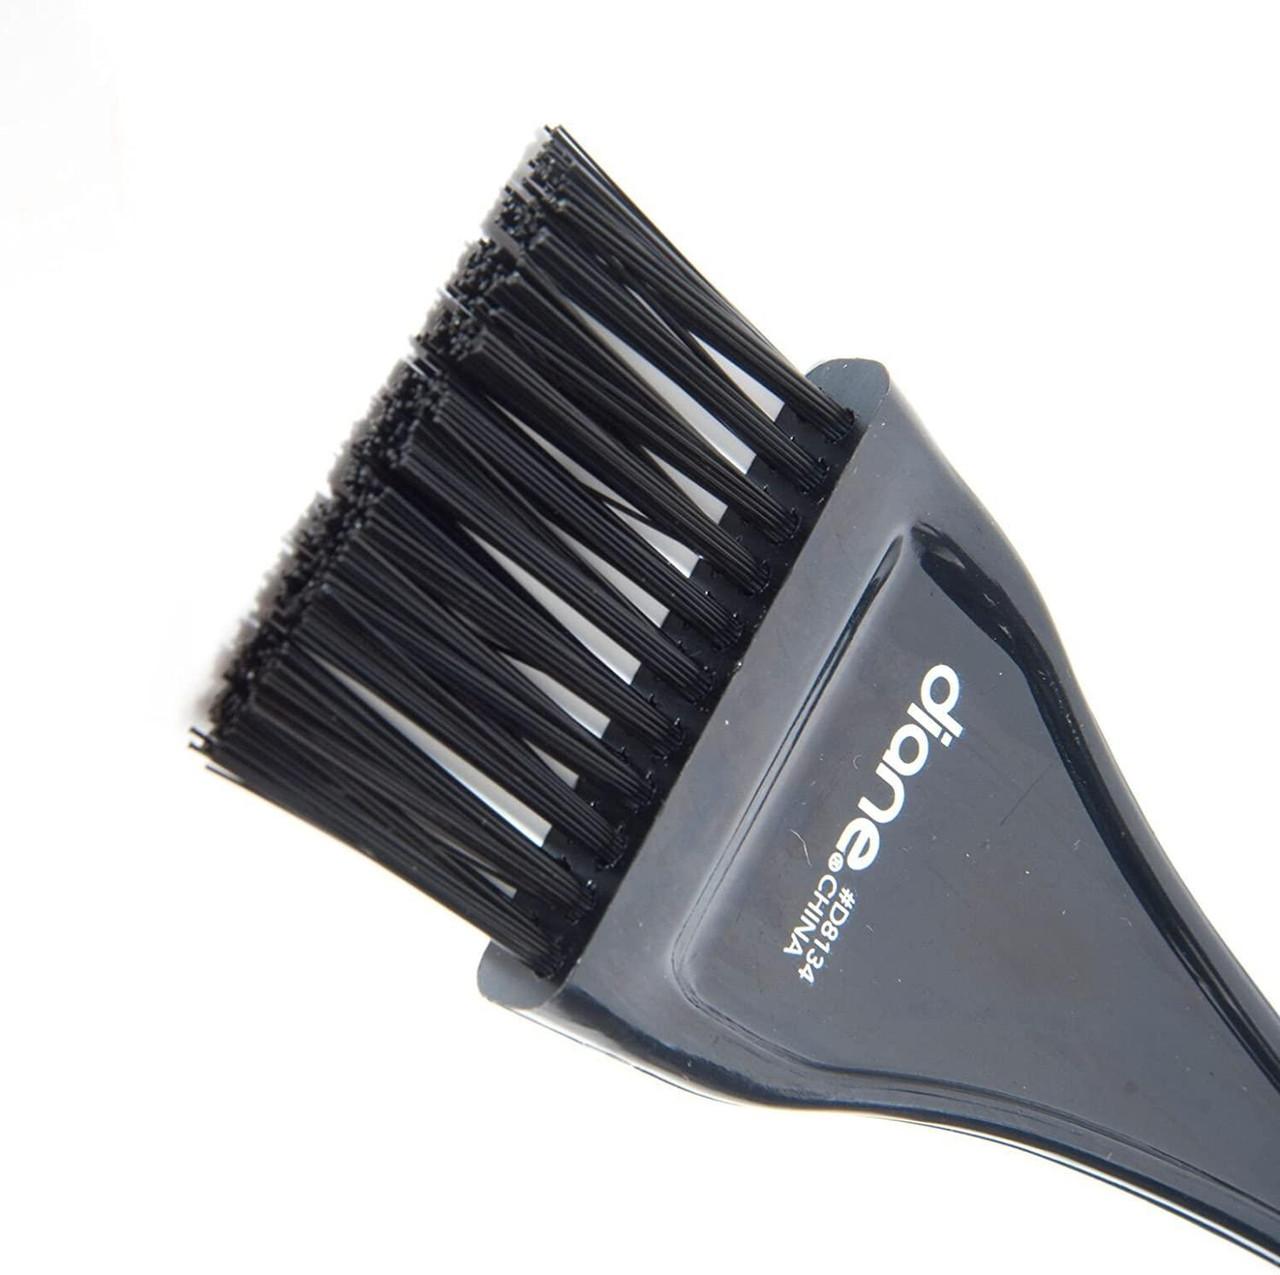 Tinting/ Dye Brush 2 Pack - Small